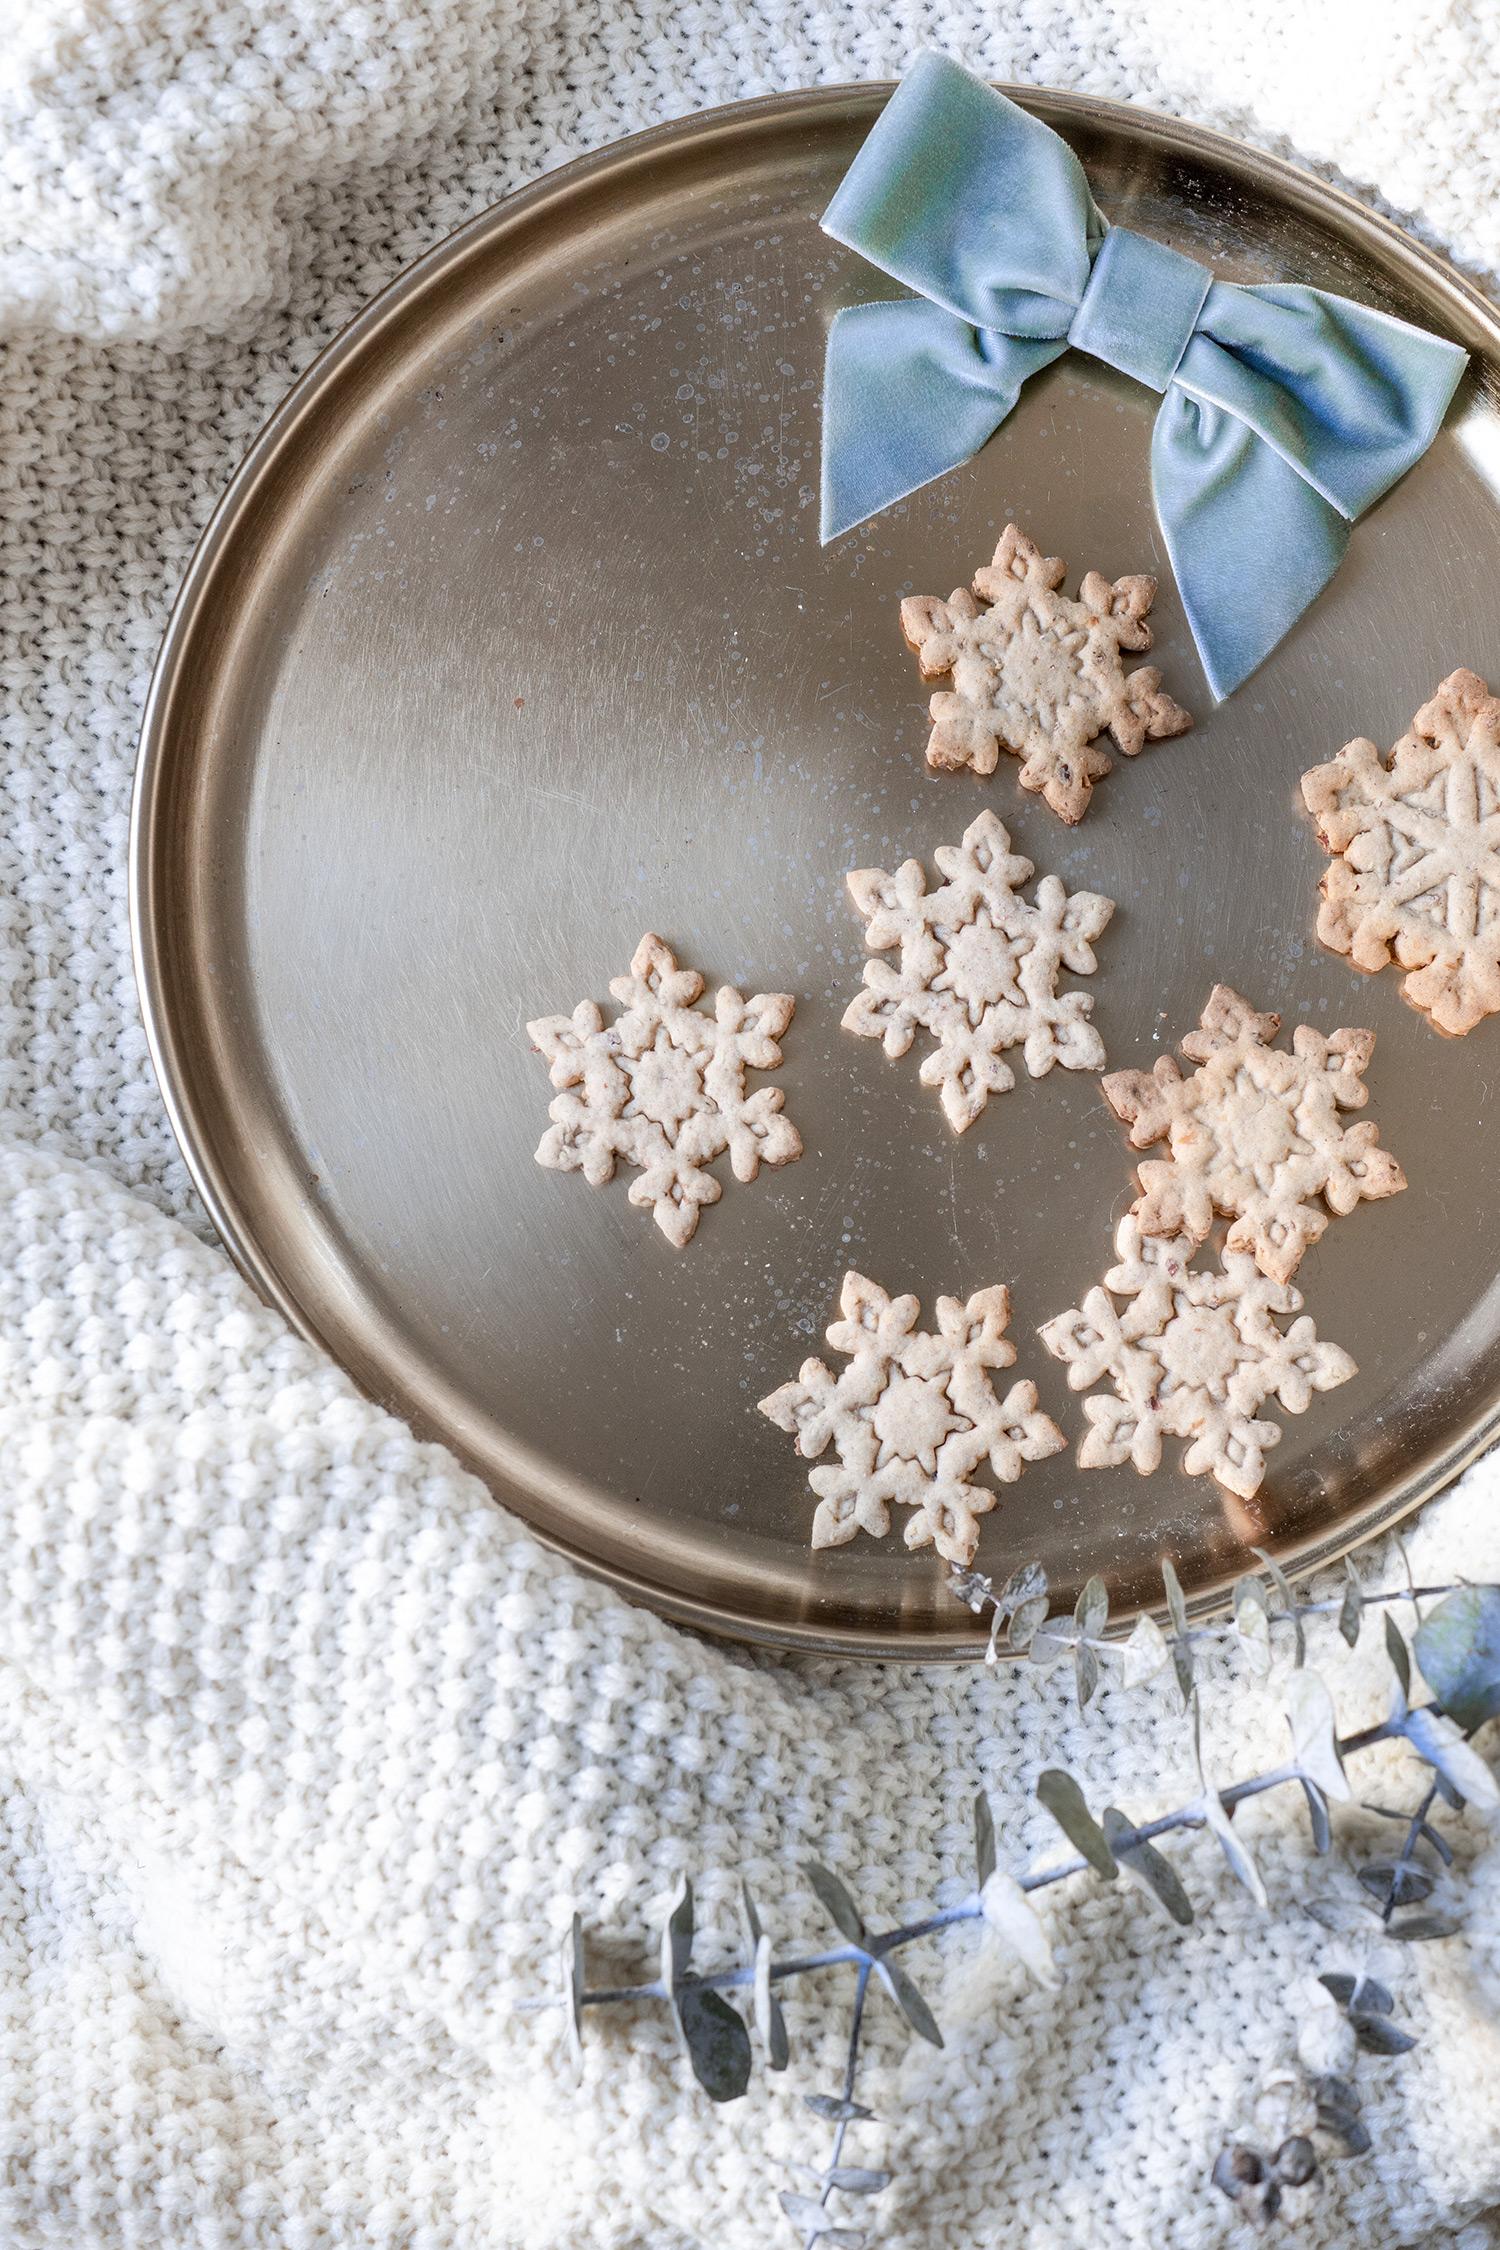 Spekulatius Kekse auf einem Tablett